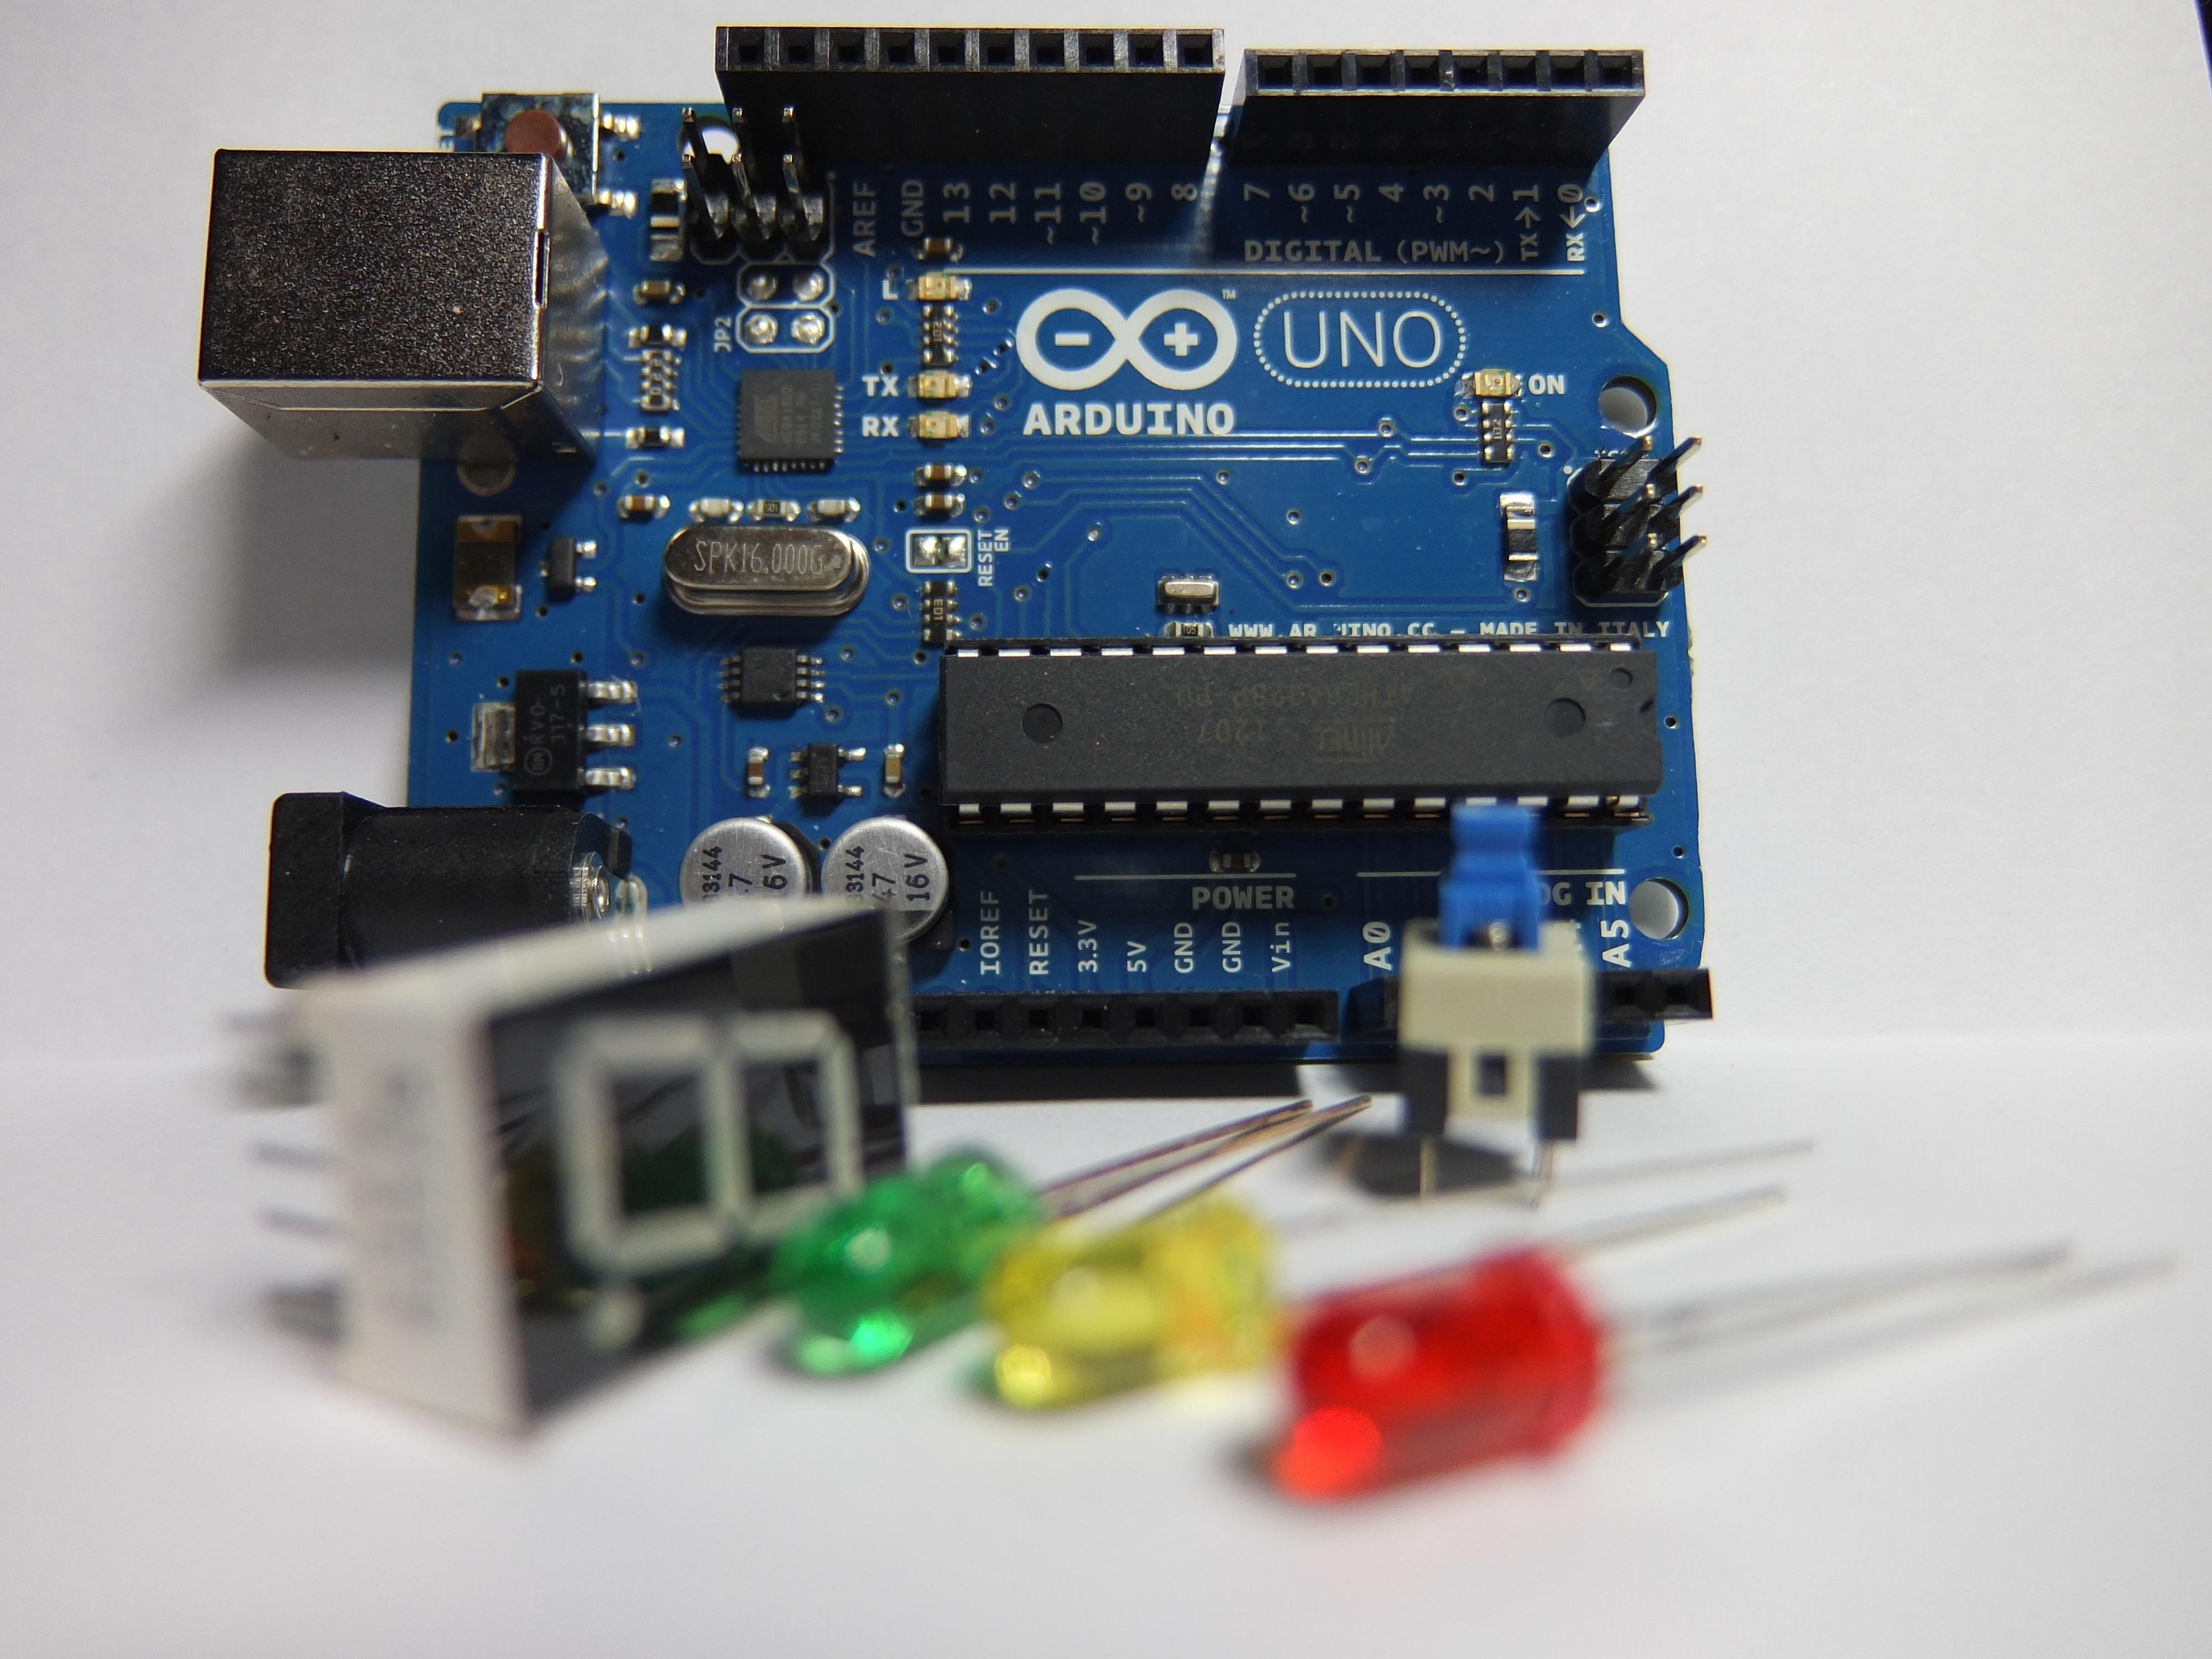 Arduino, Internet of Things